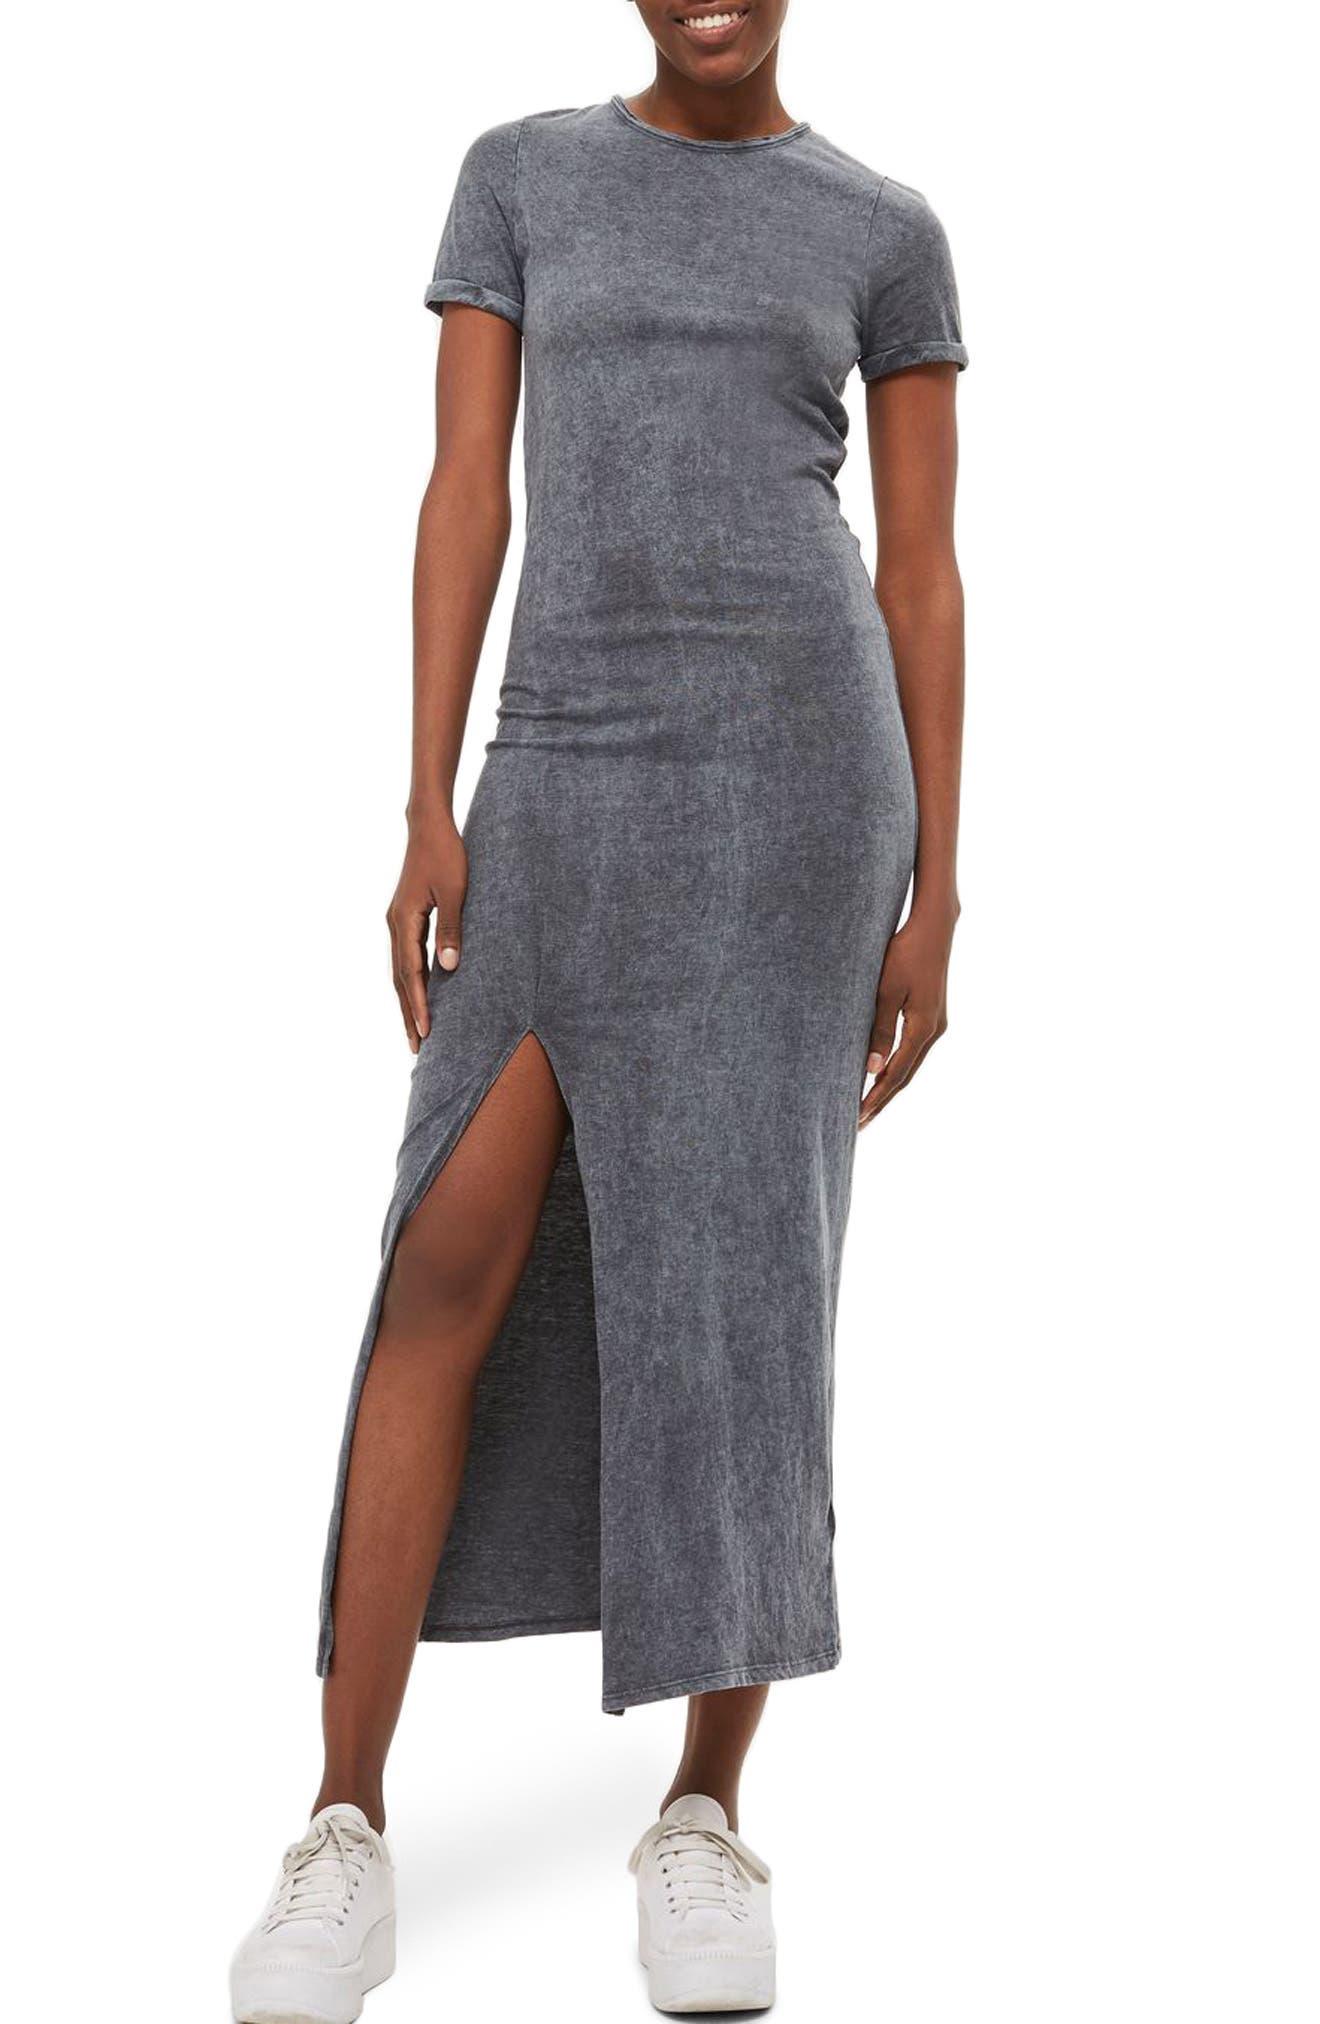 Topshop Lattice Back Jersey Maxi Dress